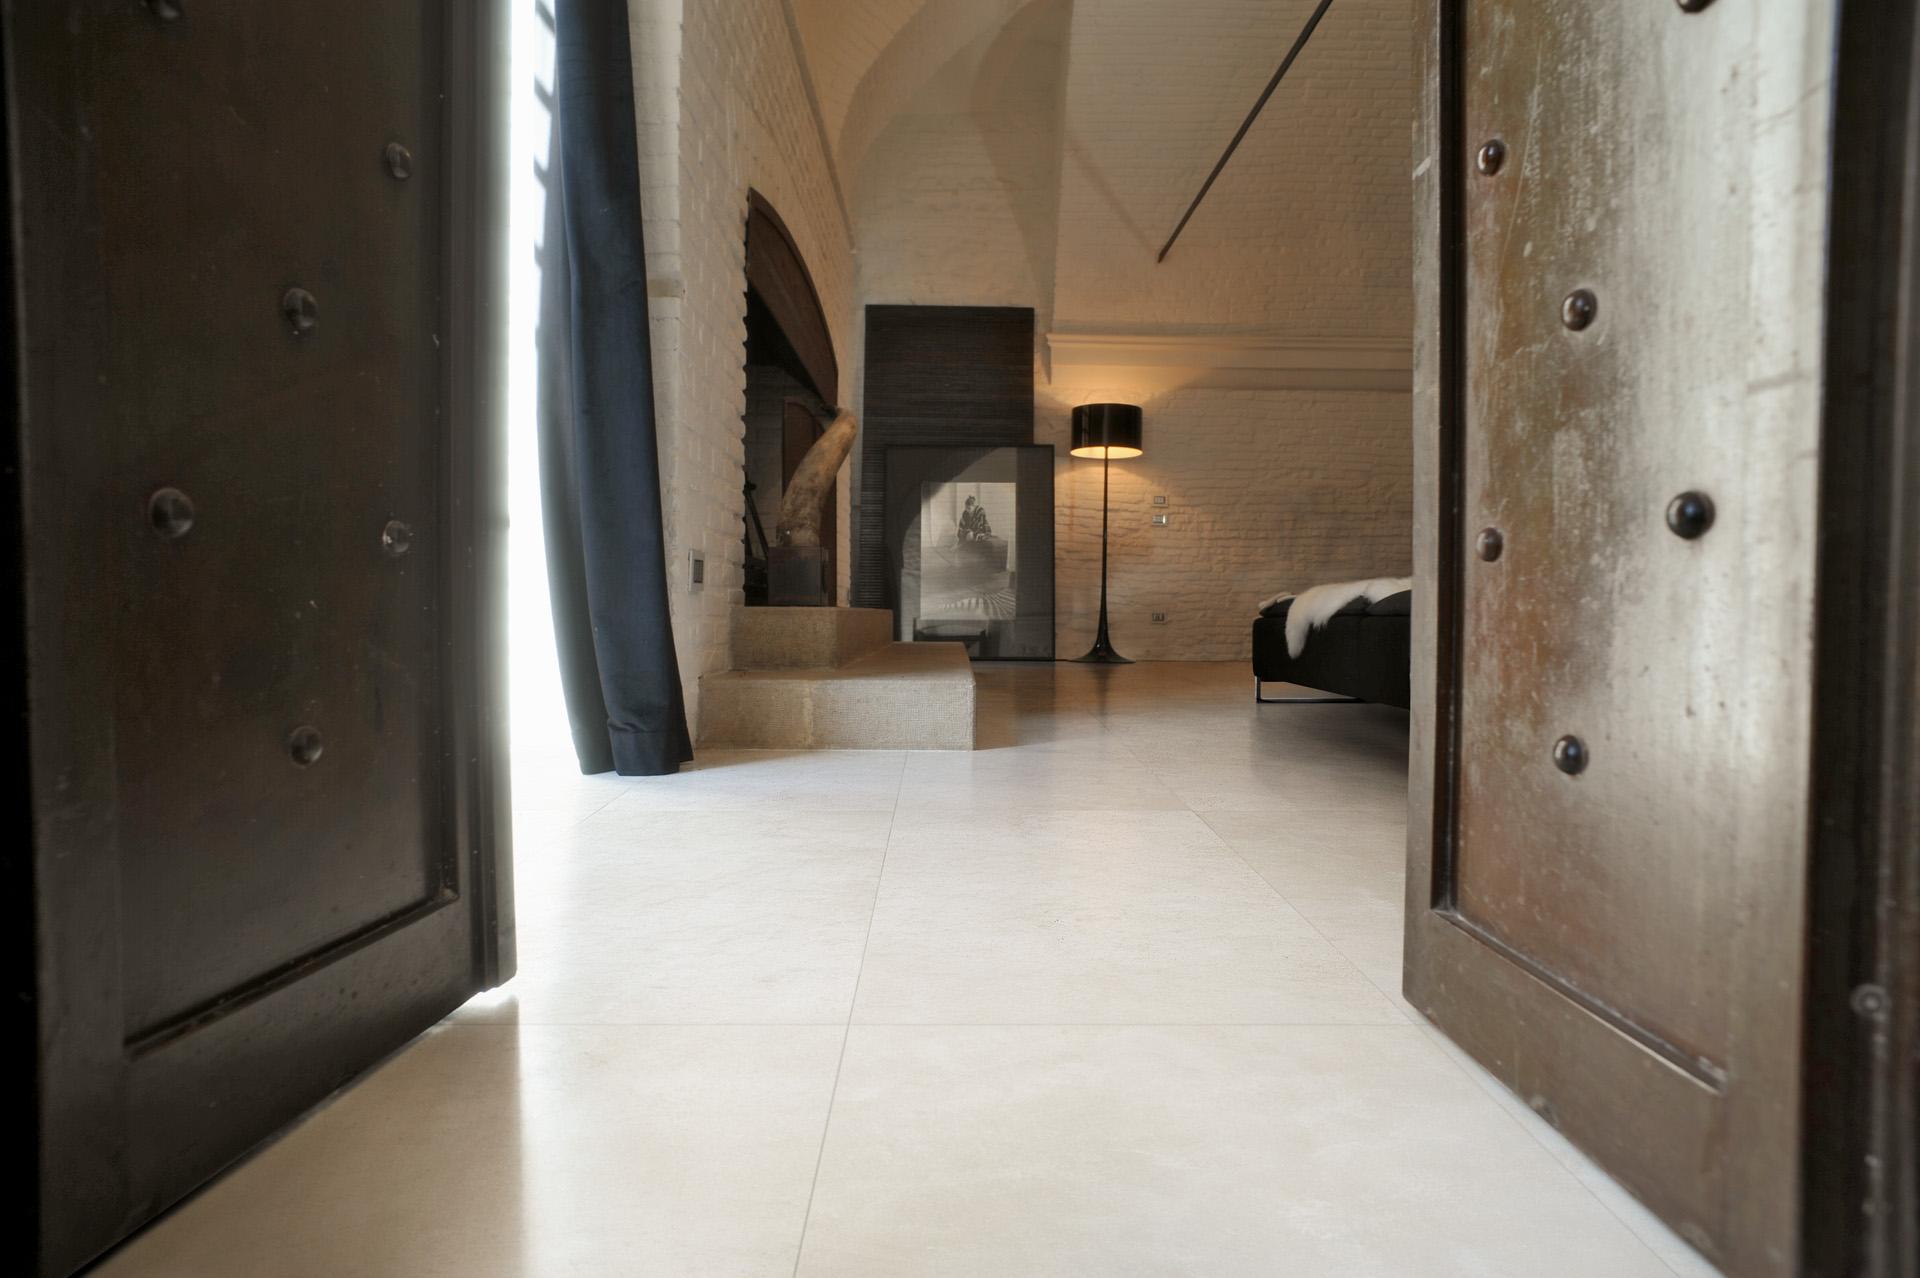 Stil_casa_belsito_cosenza_bbls_group_paviment_rivestimenti_arredo_bagno_17